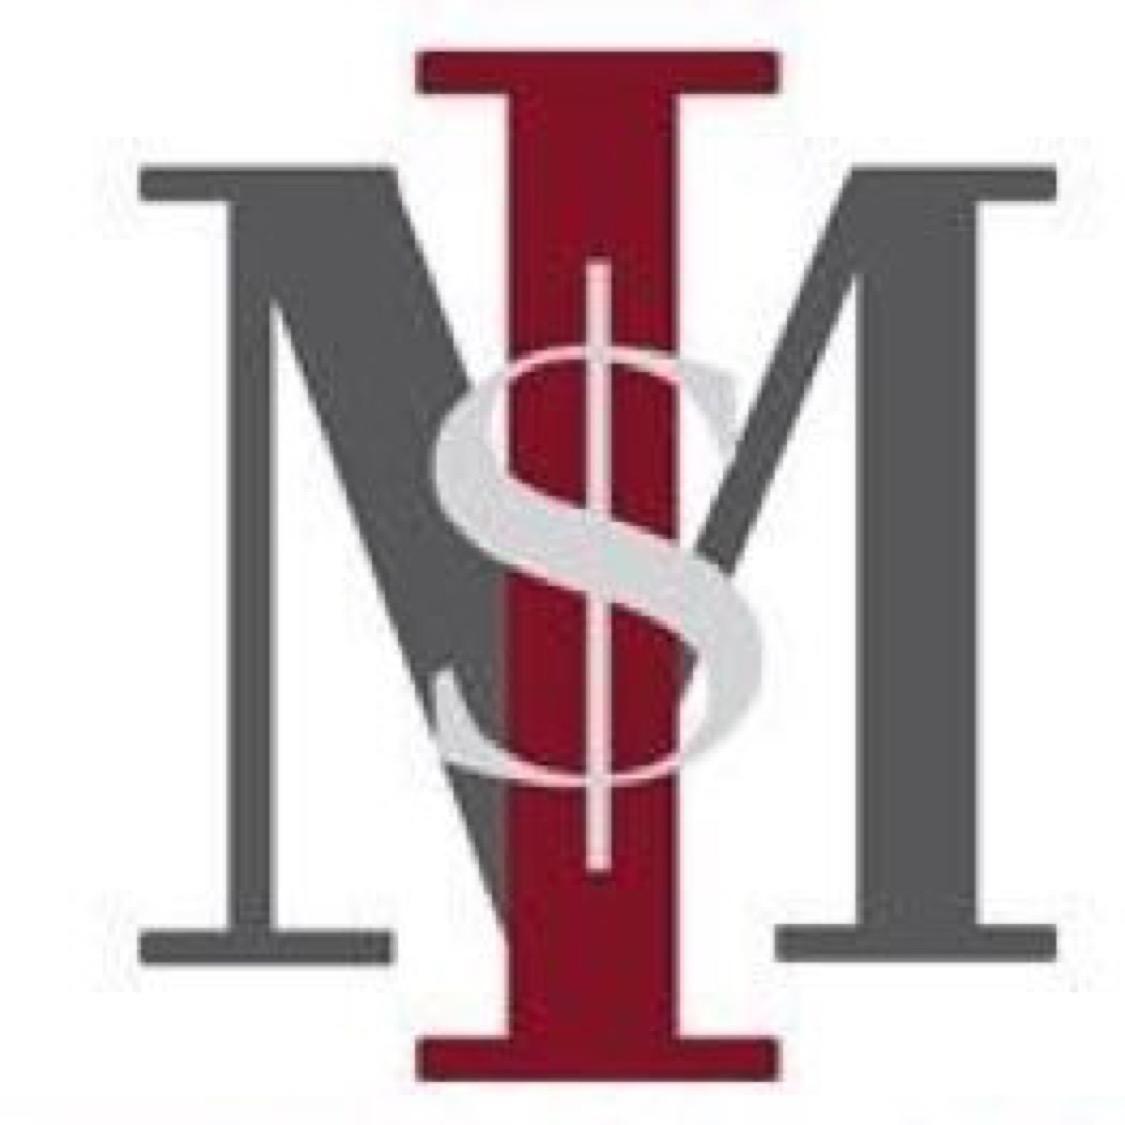 Integrative Medical Billing and Coding Solutions, LLC image 3